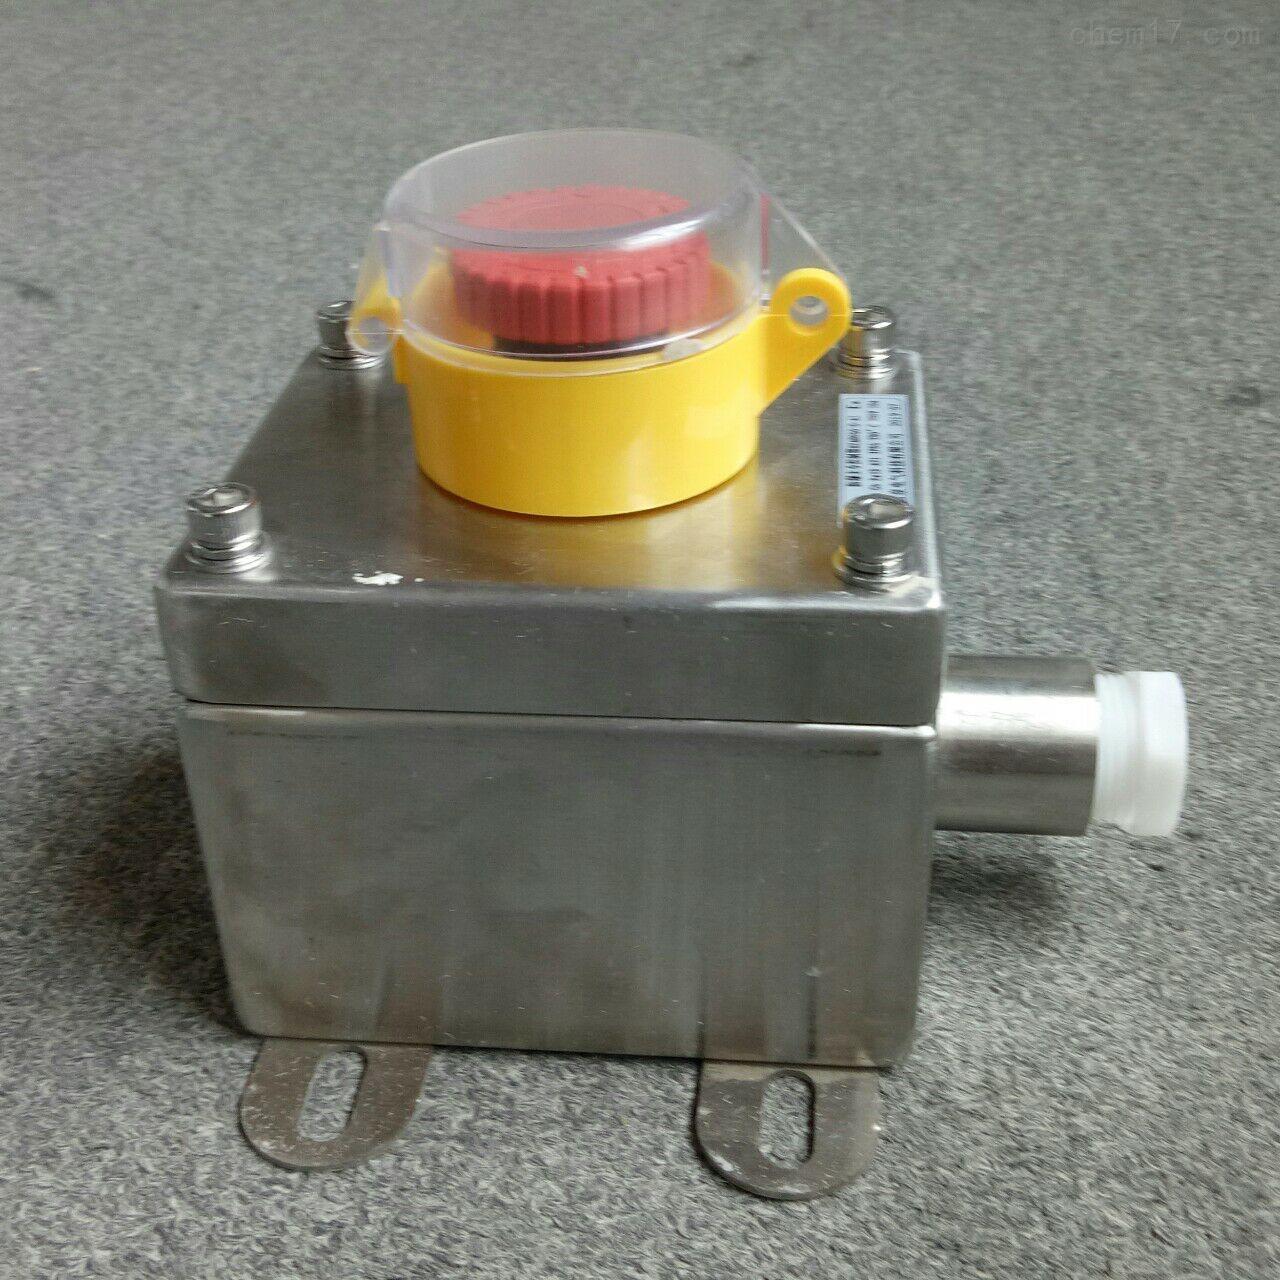 BZA8050-G-A1言泉厂家不锈钢防爆急停按钮盒